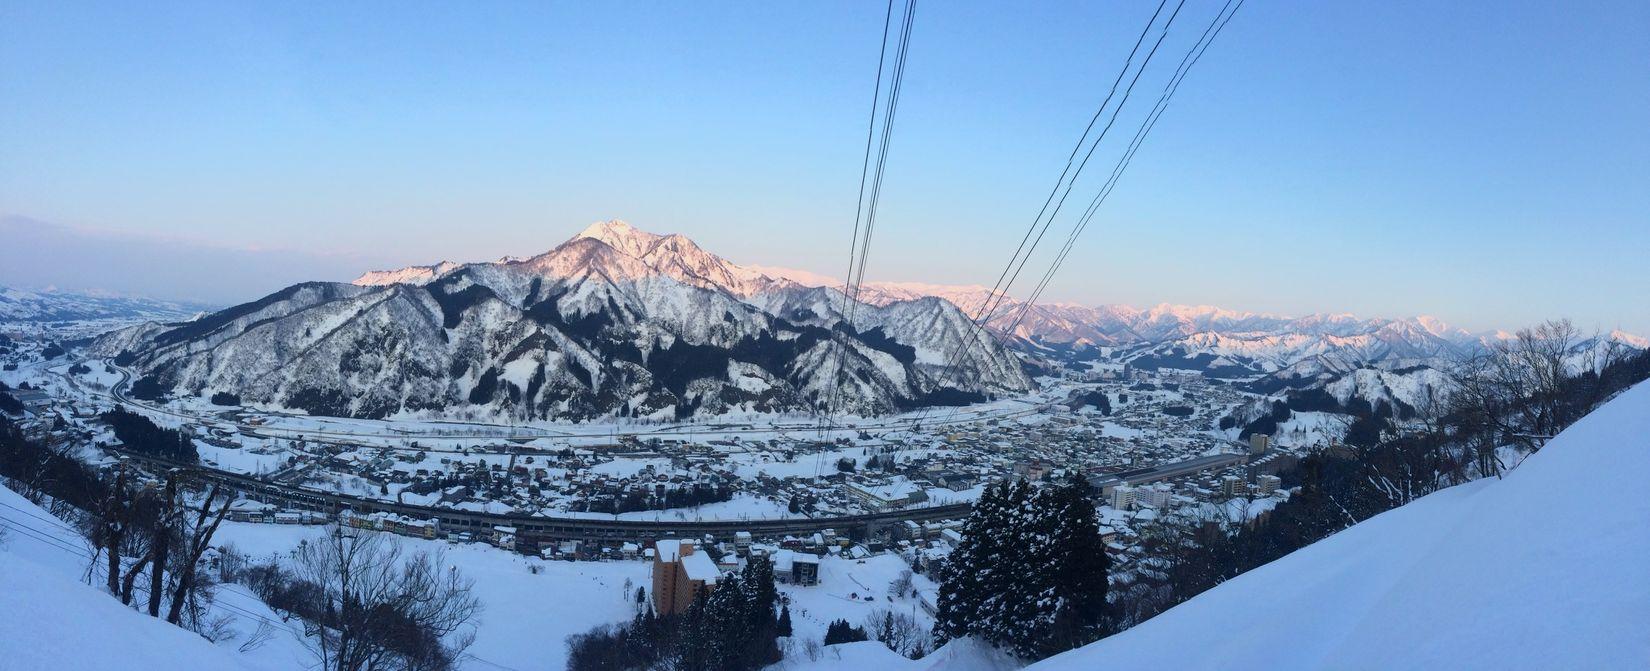 the way to go home after job. Snowboarding YUZAWA Hello World Home Salomon